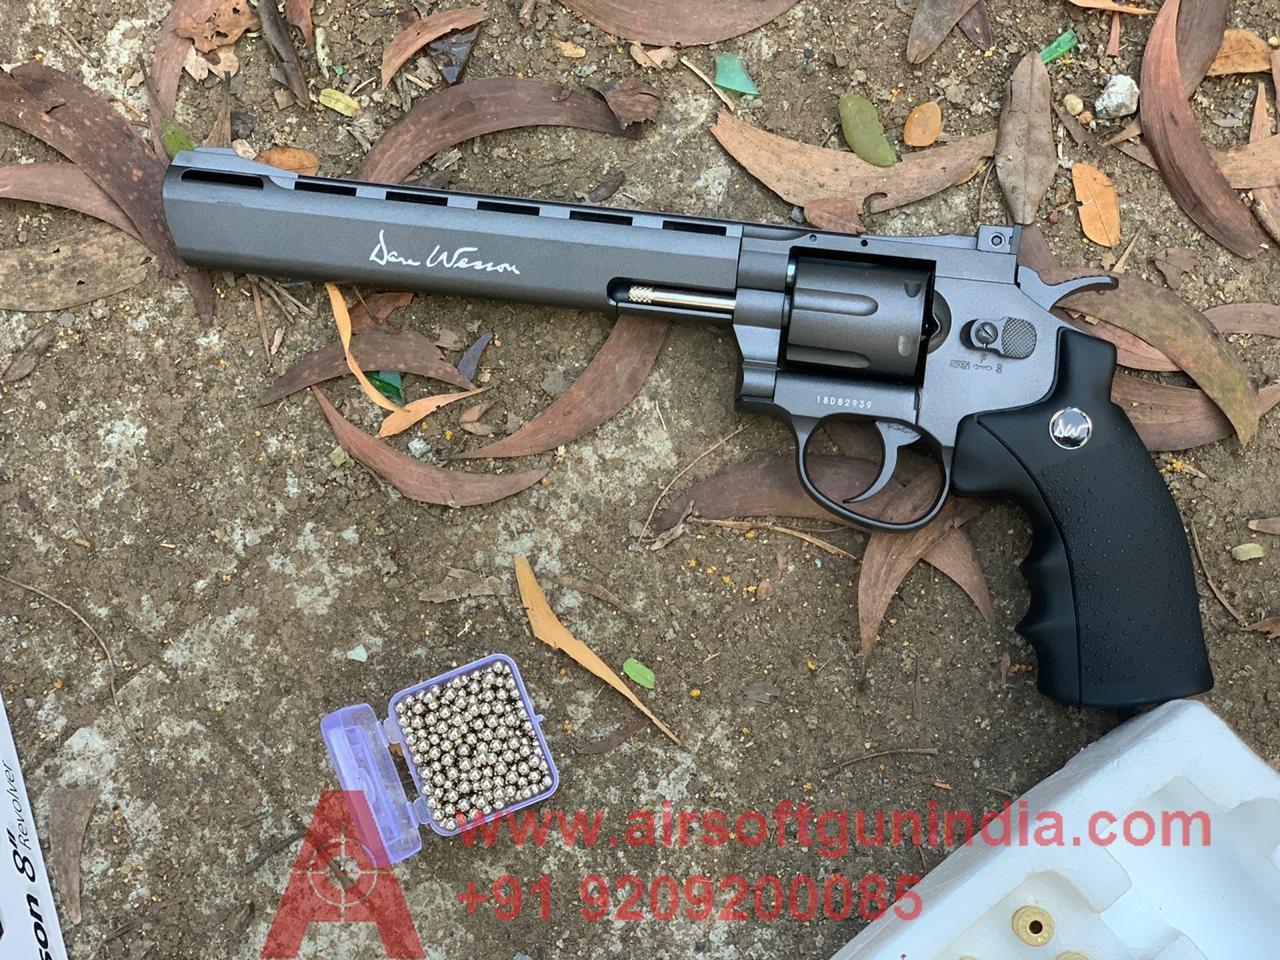 Dan Wesson 8 Inch  CO2 BB Revolver, Black By Airsoft Gun India